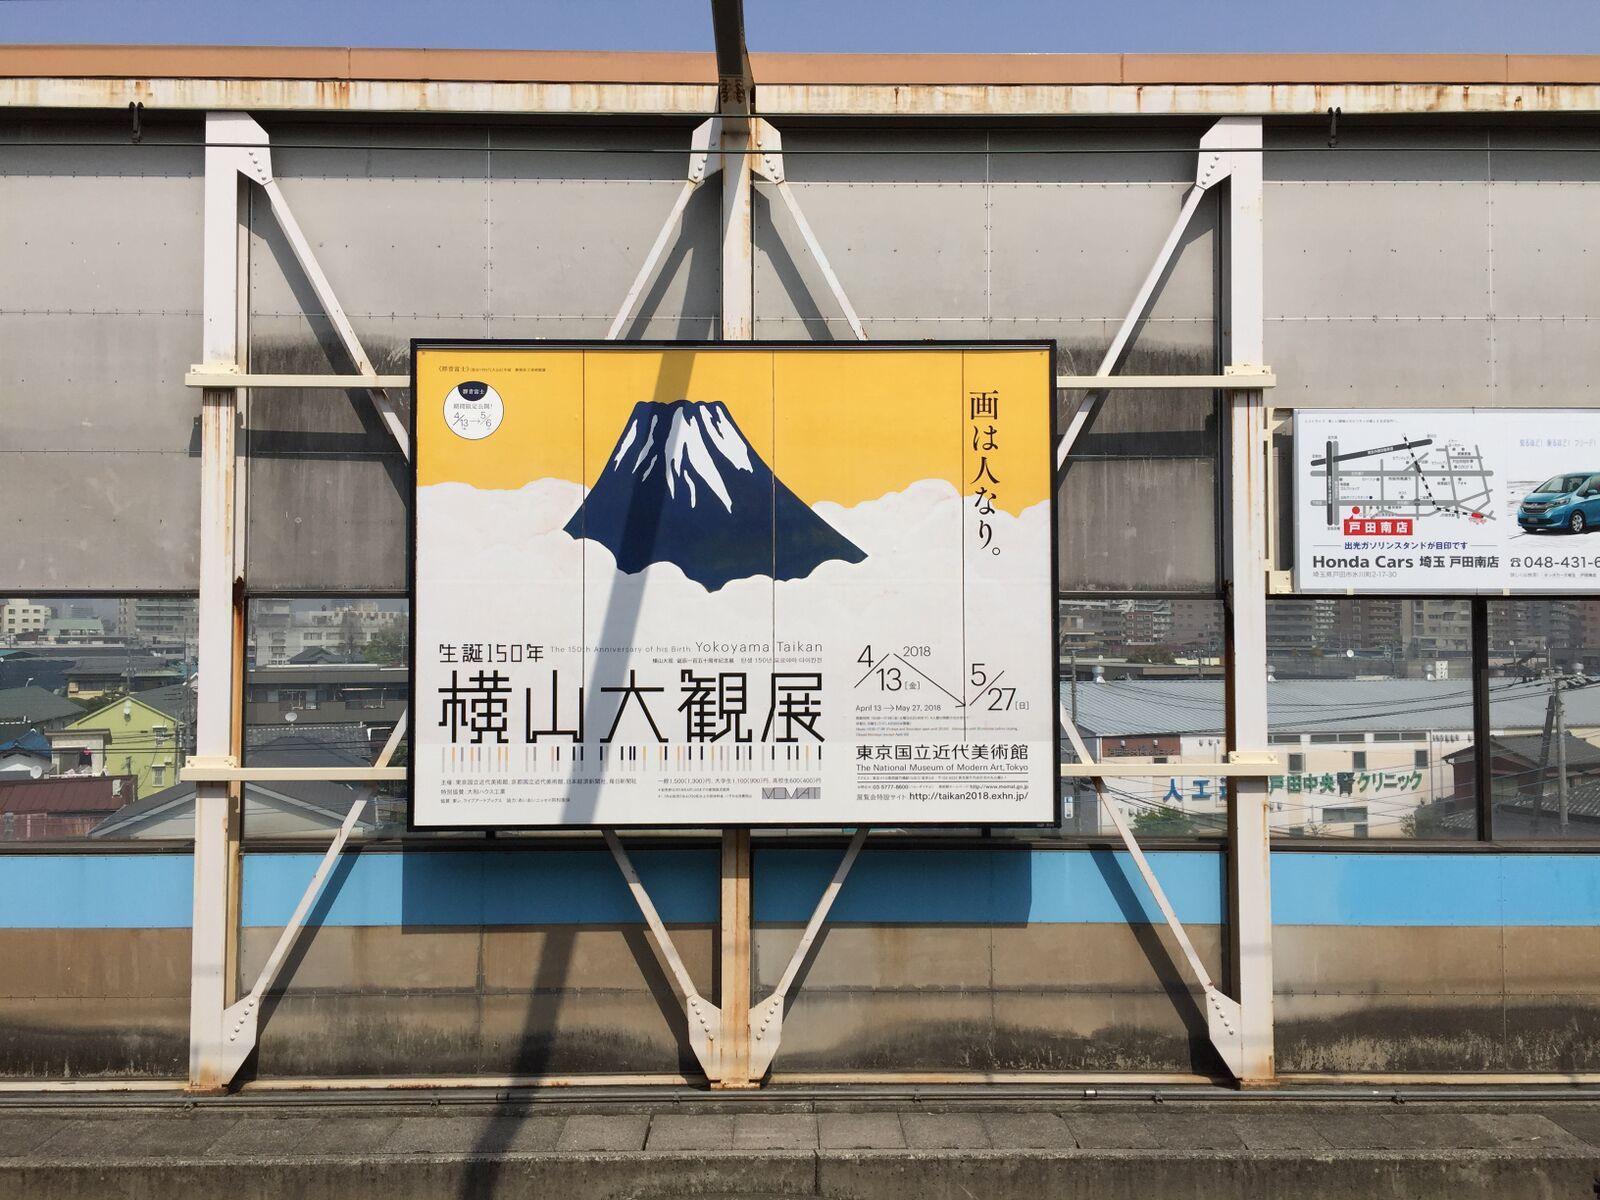 横山大観展の駅看板